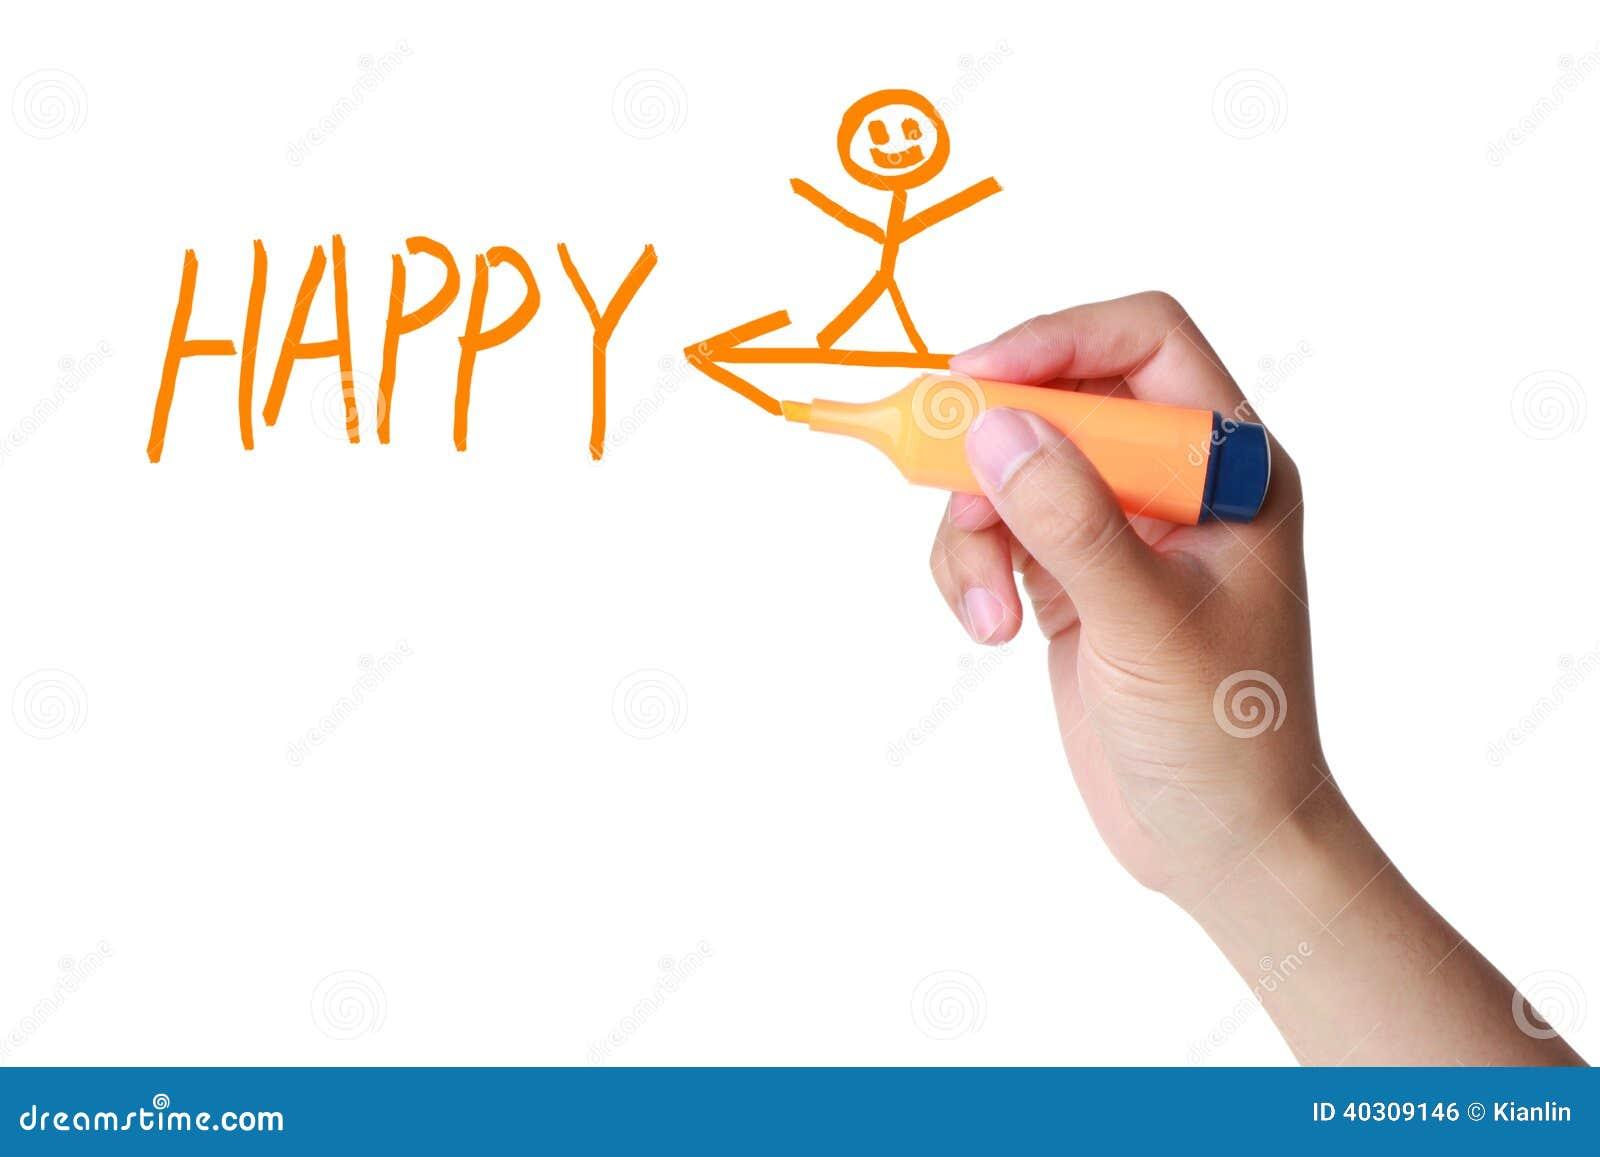 Soyez heureux maintenant